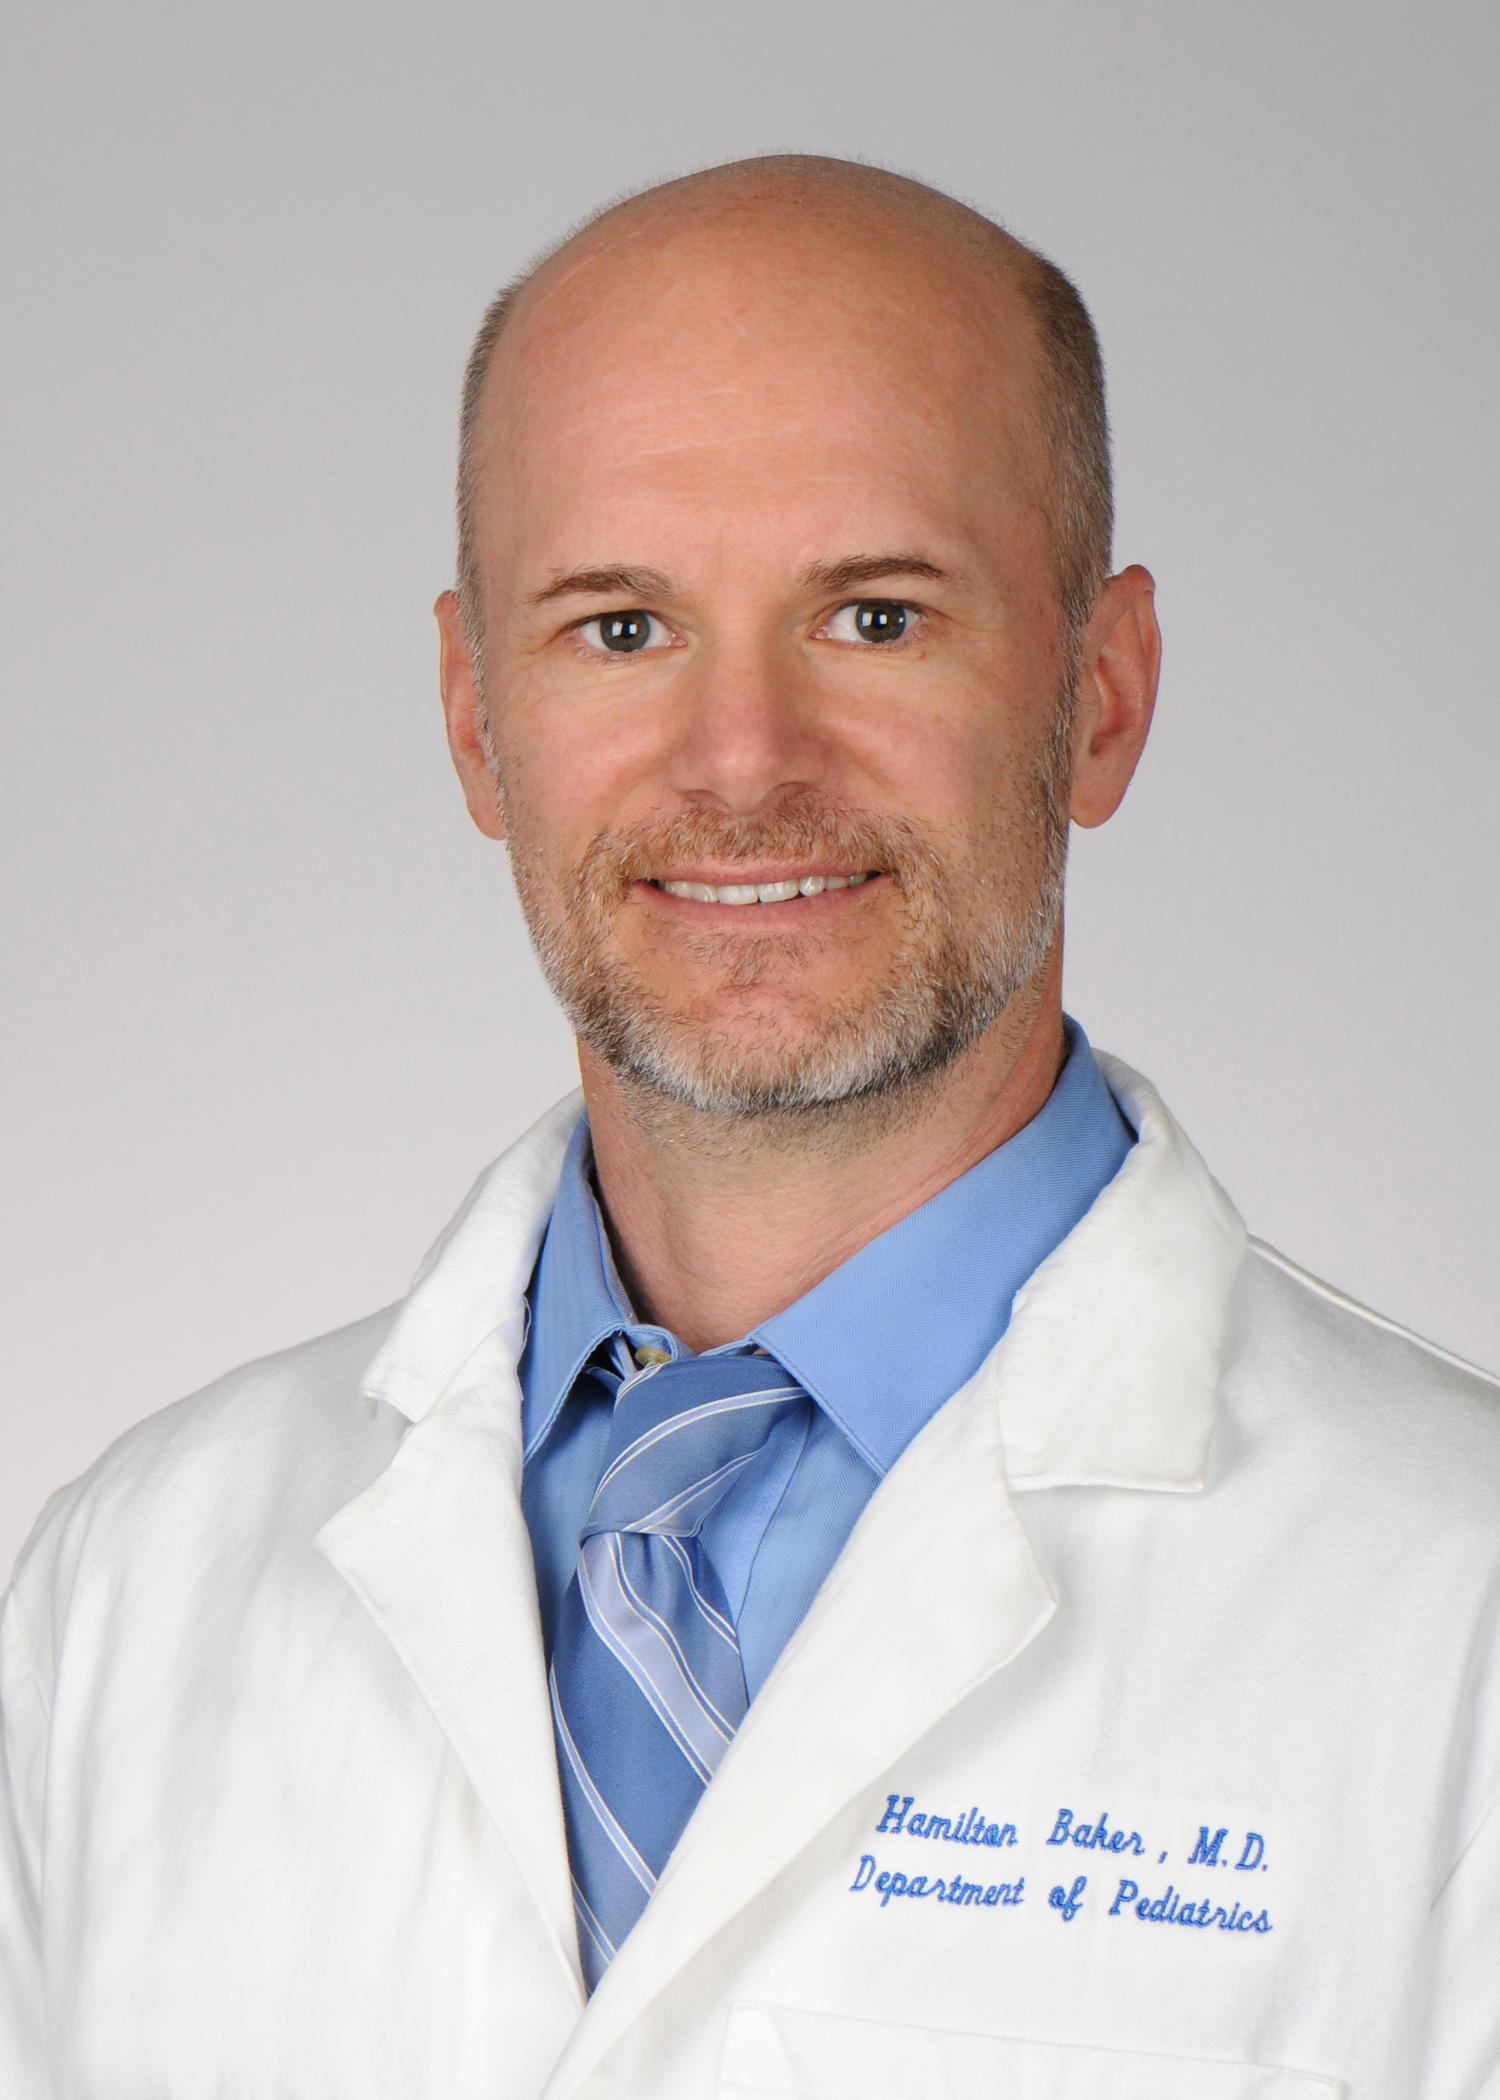 George Hamilton Baker, MD image 0